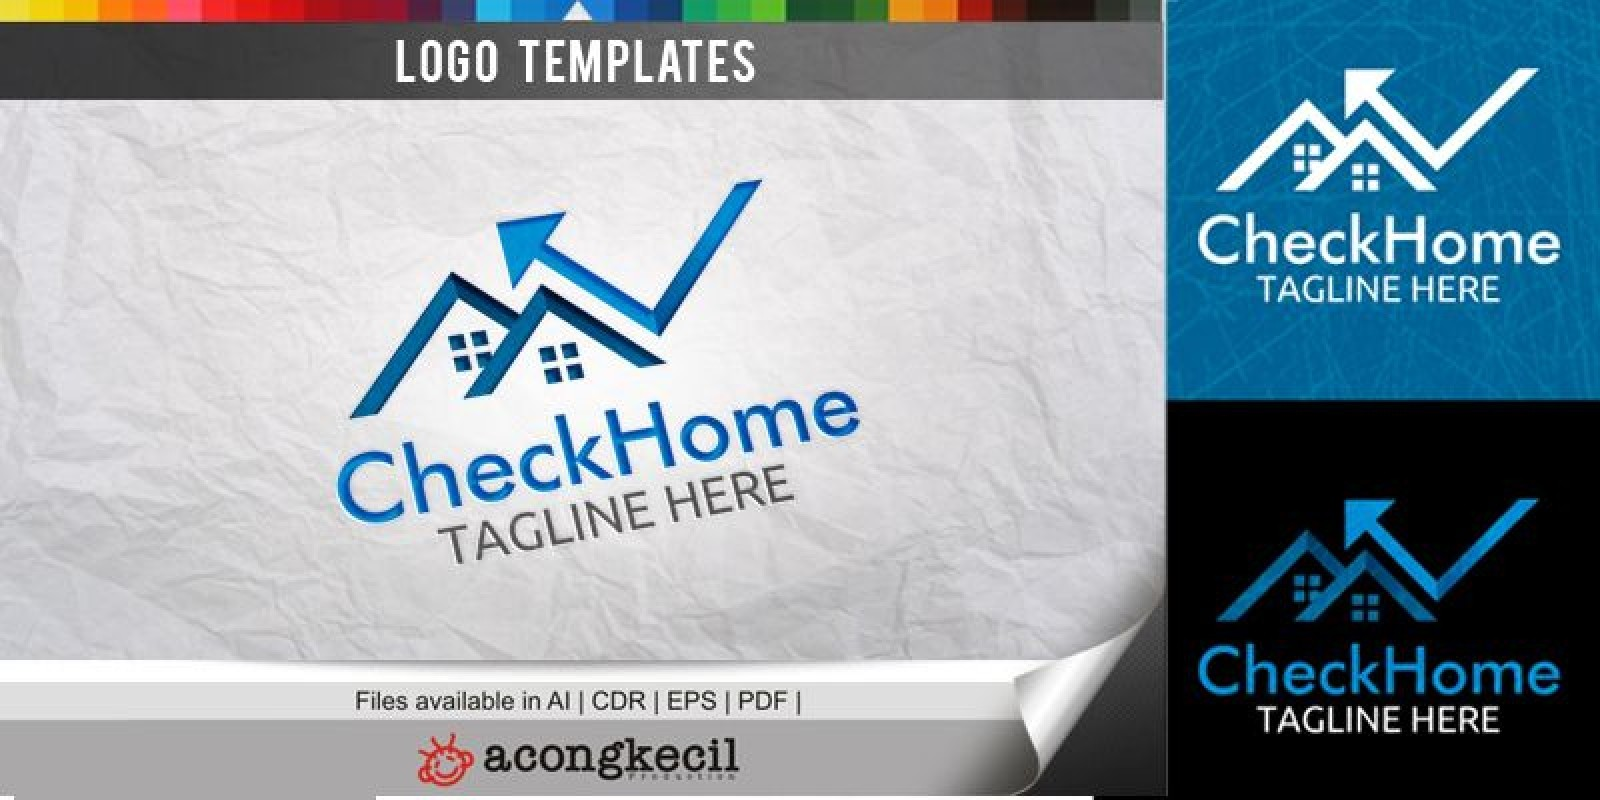 Check Home - Logo Template